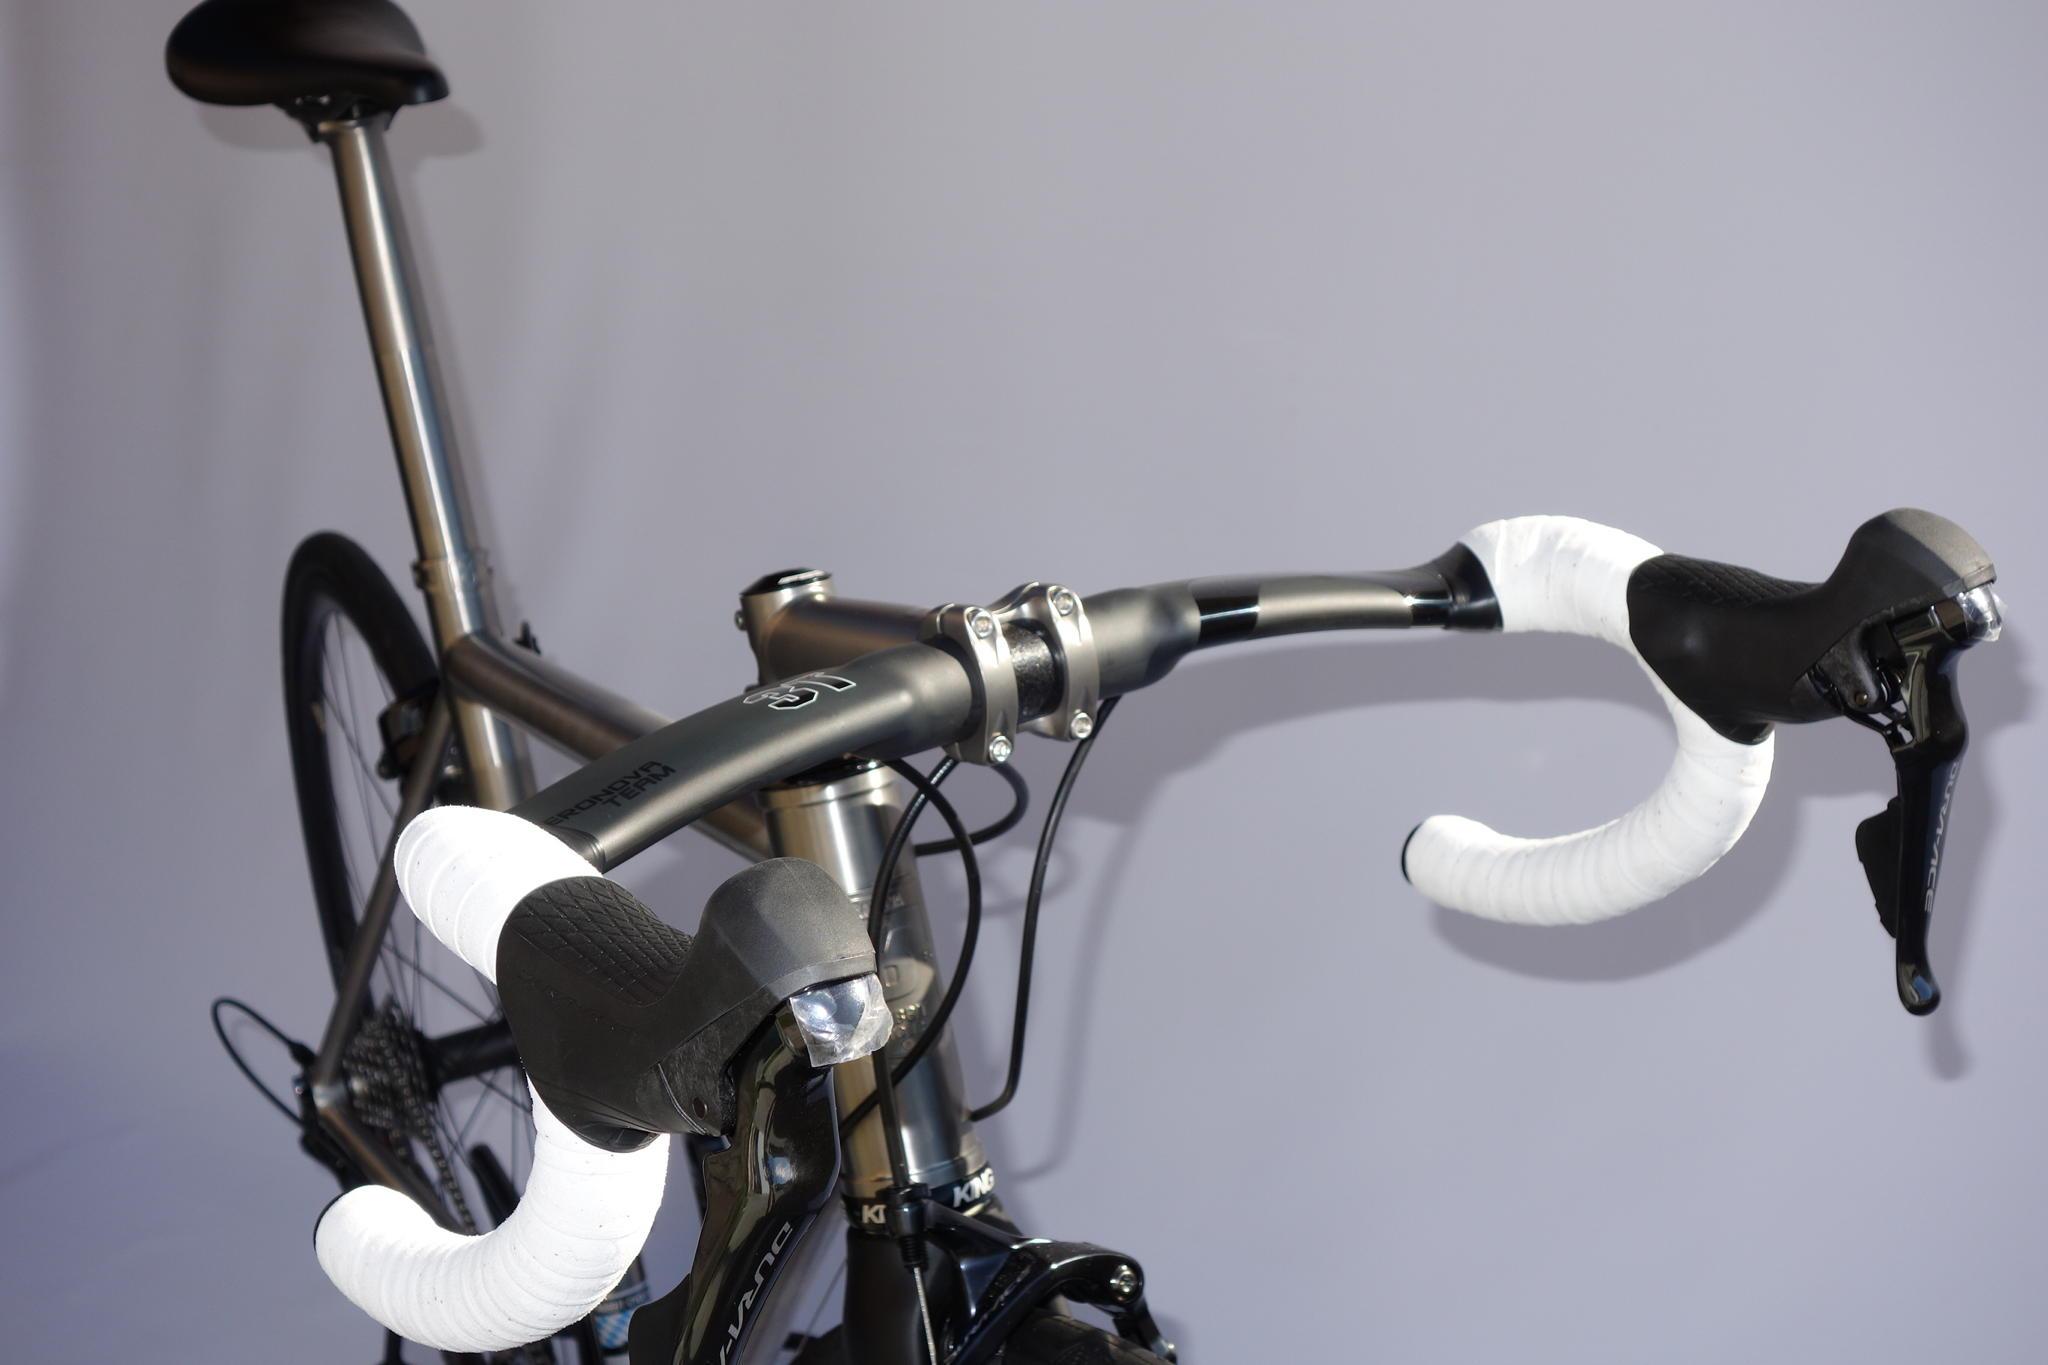 rabbit_cycles_titan_road_classic_dsc03074